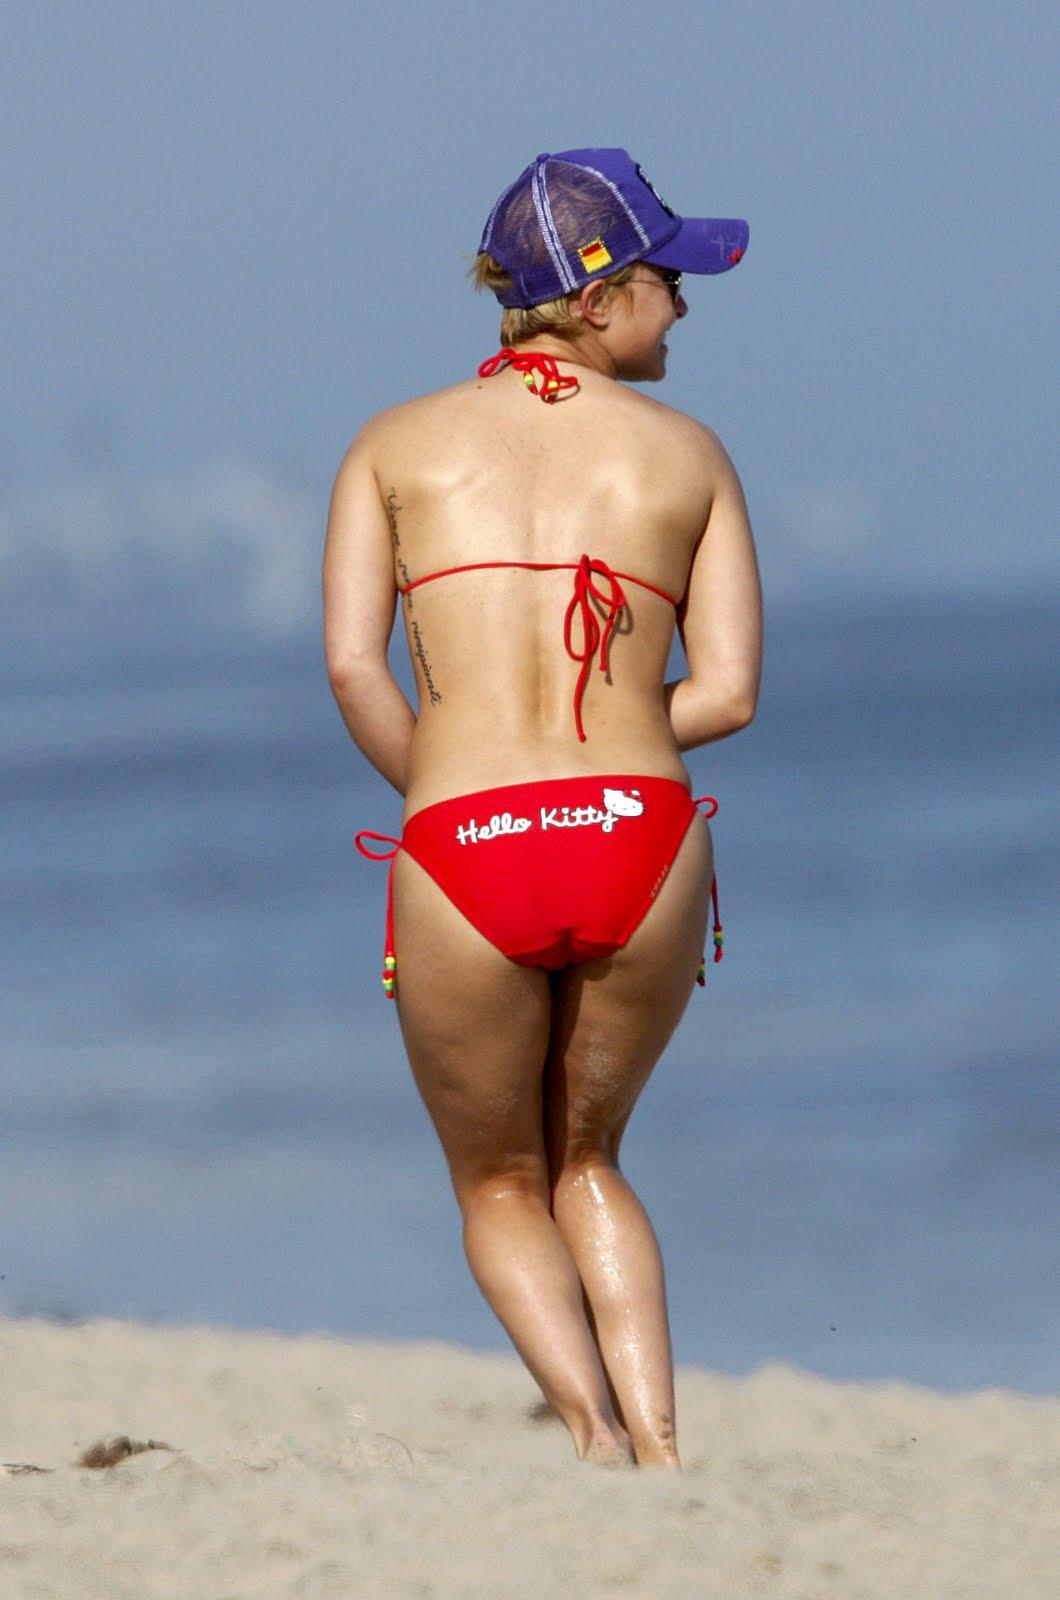 http://2.bp.blogspot.com/_rYsbaPefOns/TBCyqzrchyI/AAAAAAAASGY/FmrpI6SGOLQ/s1600/Hayden_Panettiere-Malibu_bikini-HQ_Pictures_003.jpg